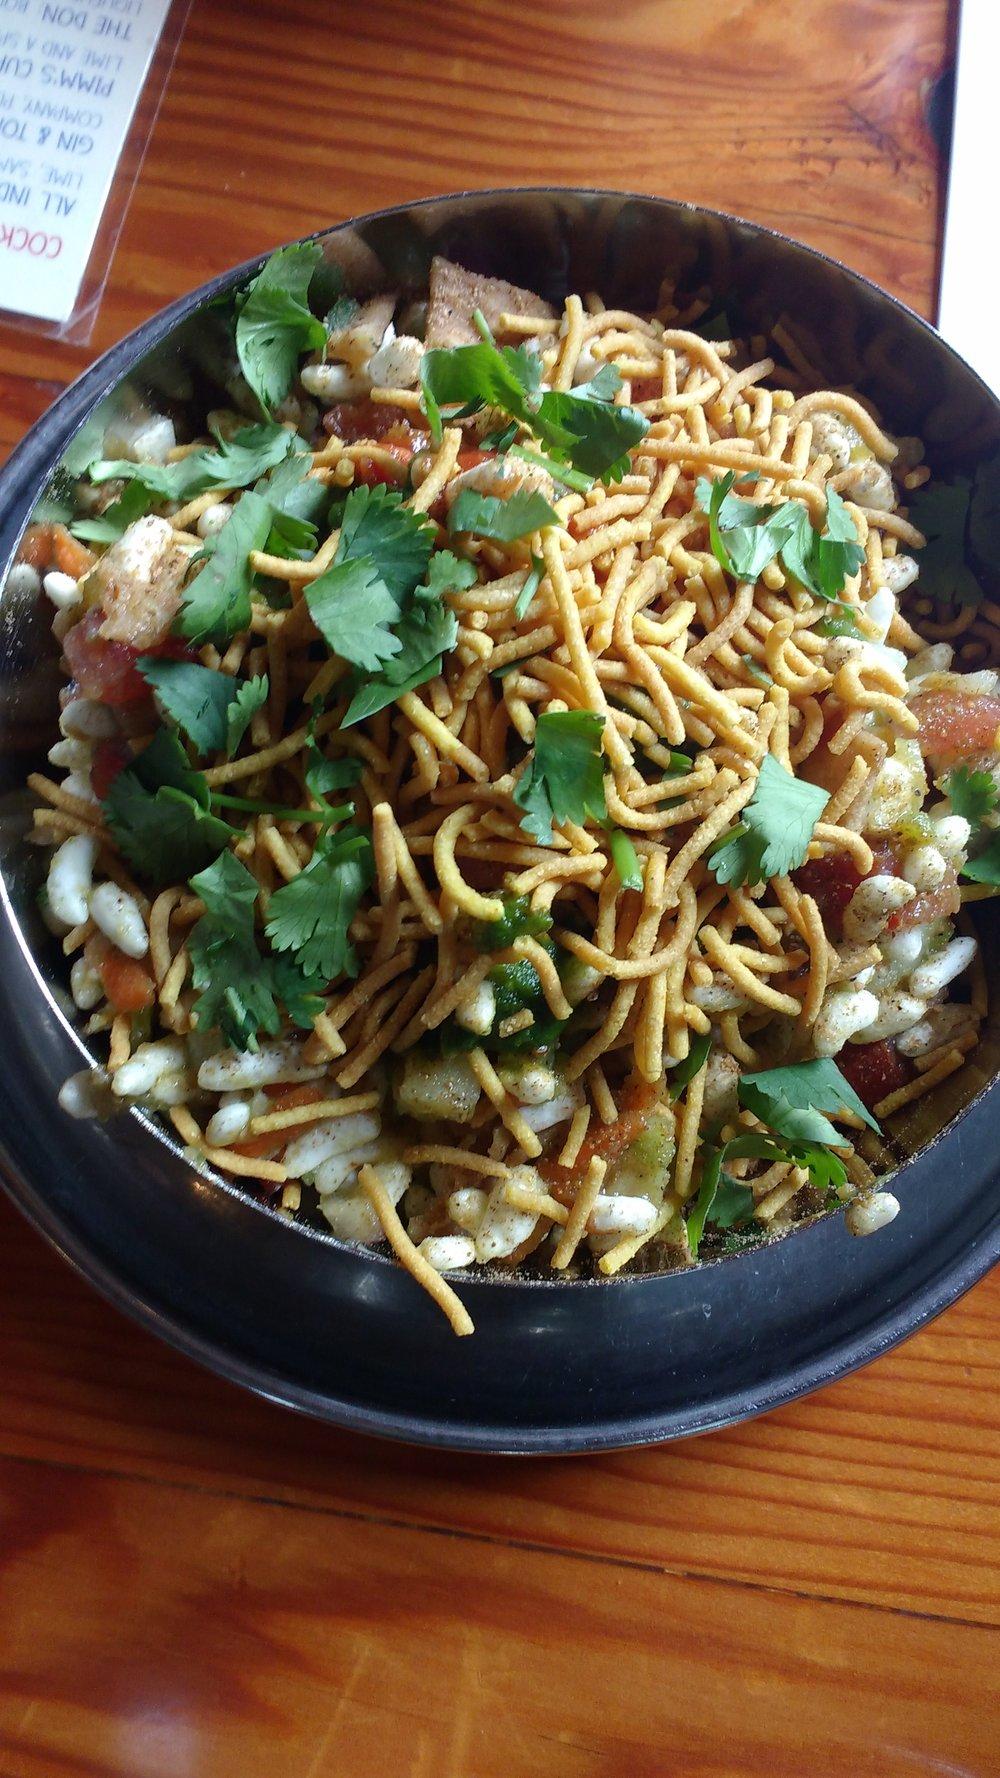 Bhel Puri, an Indian salad made with from-scratch ingredients. Viki Eierdam